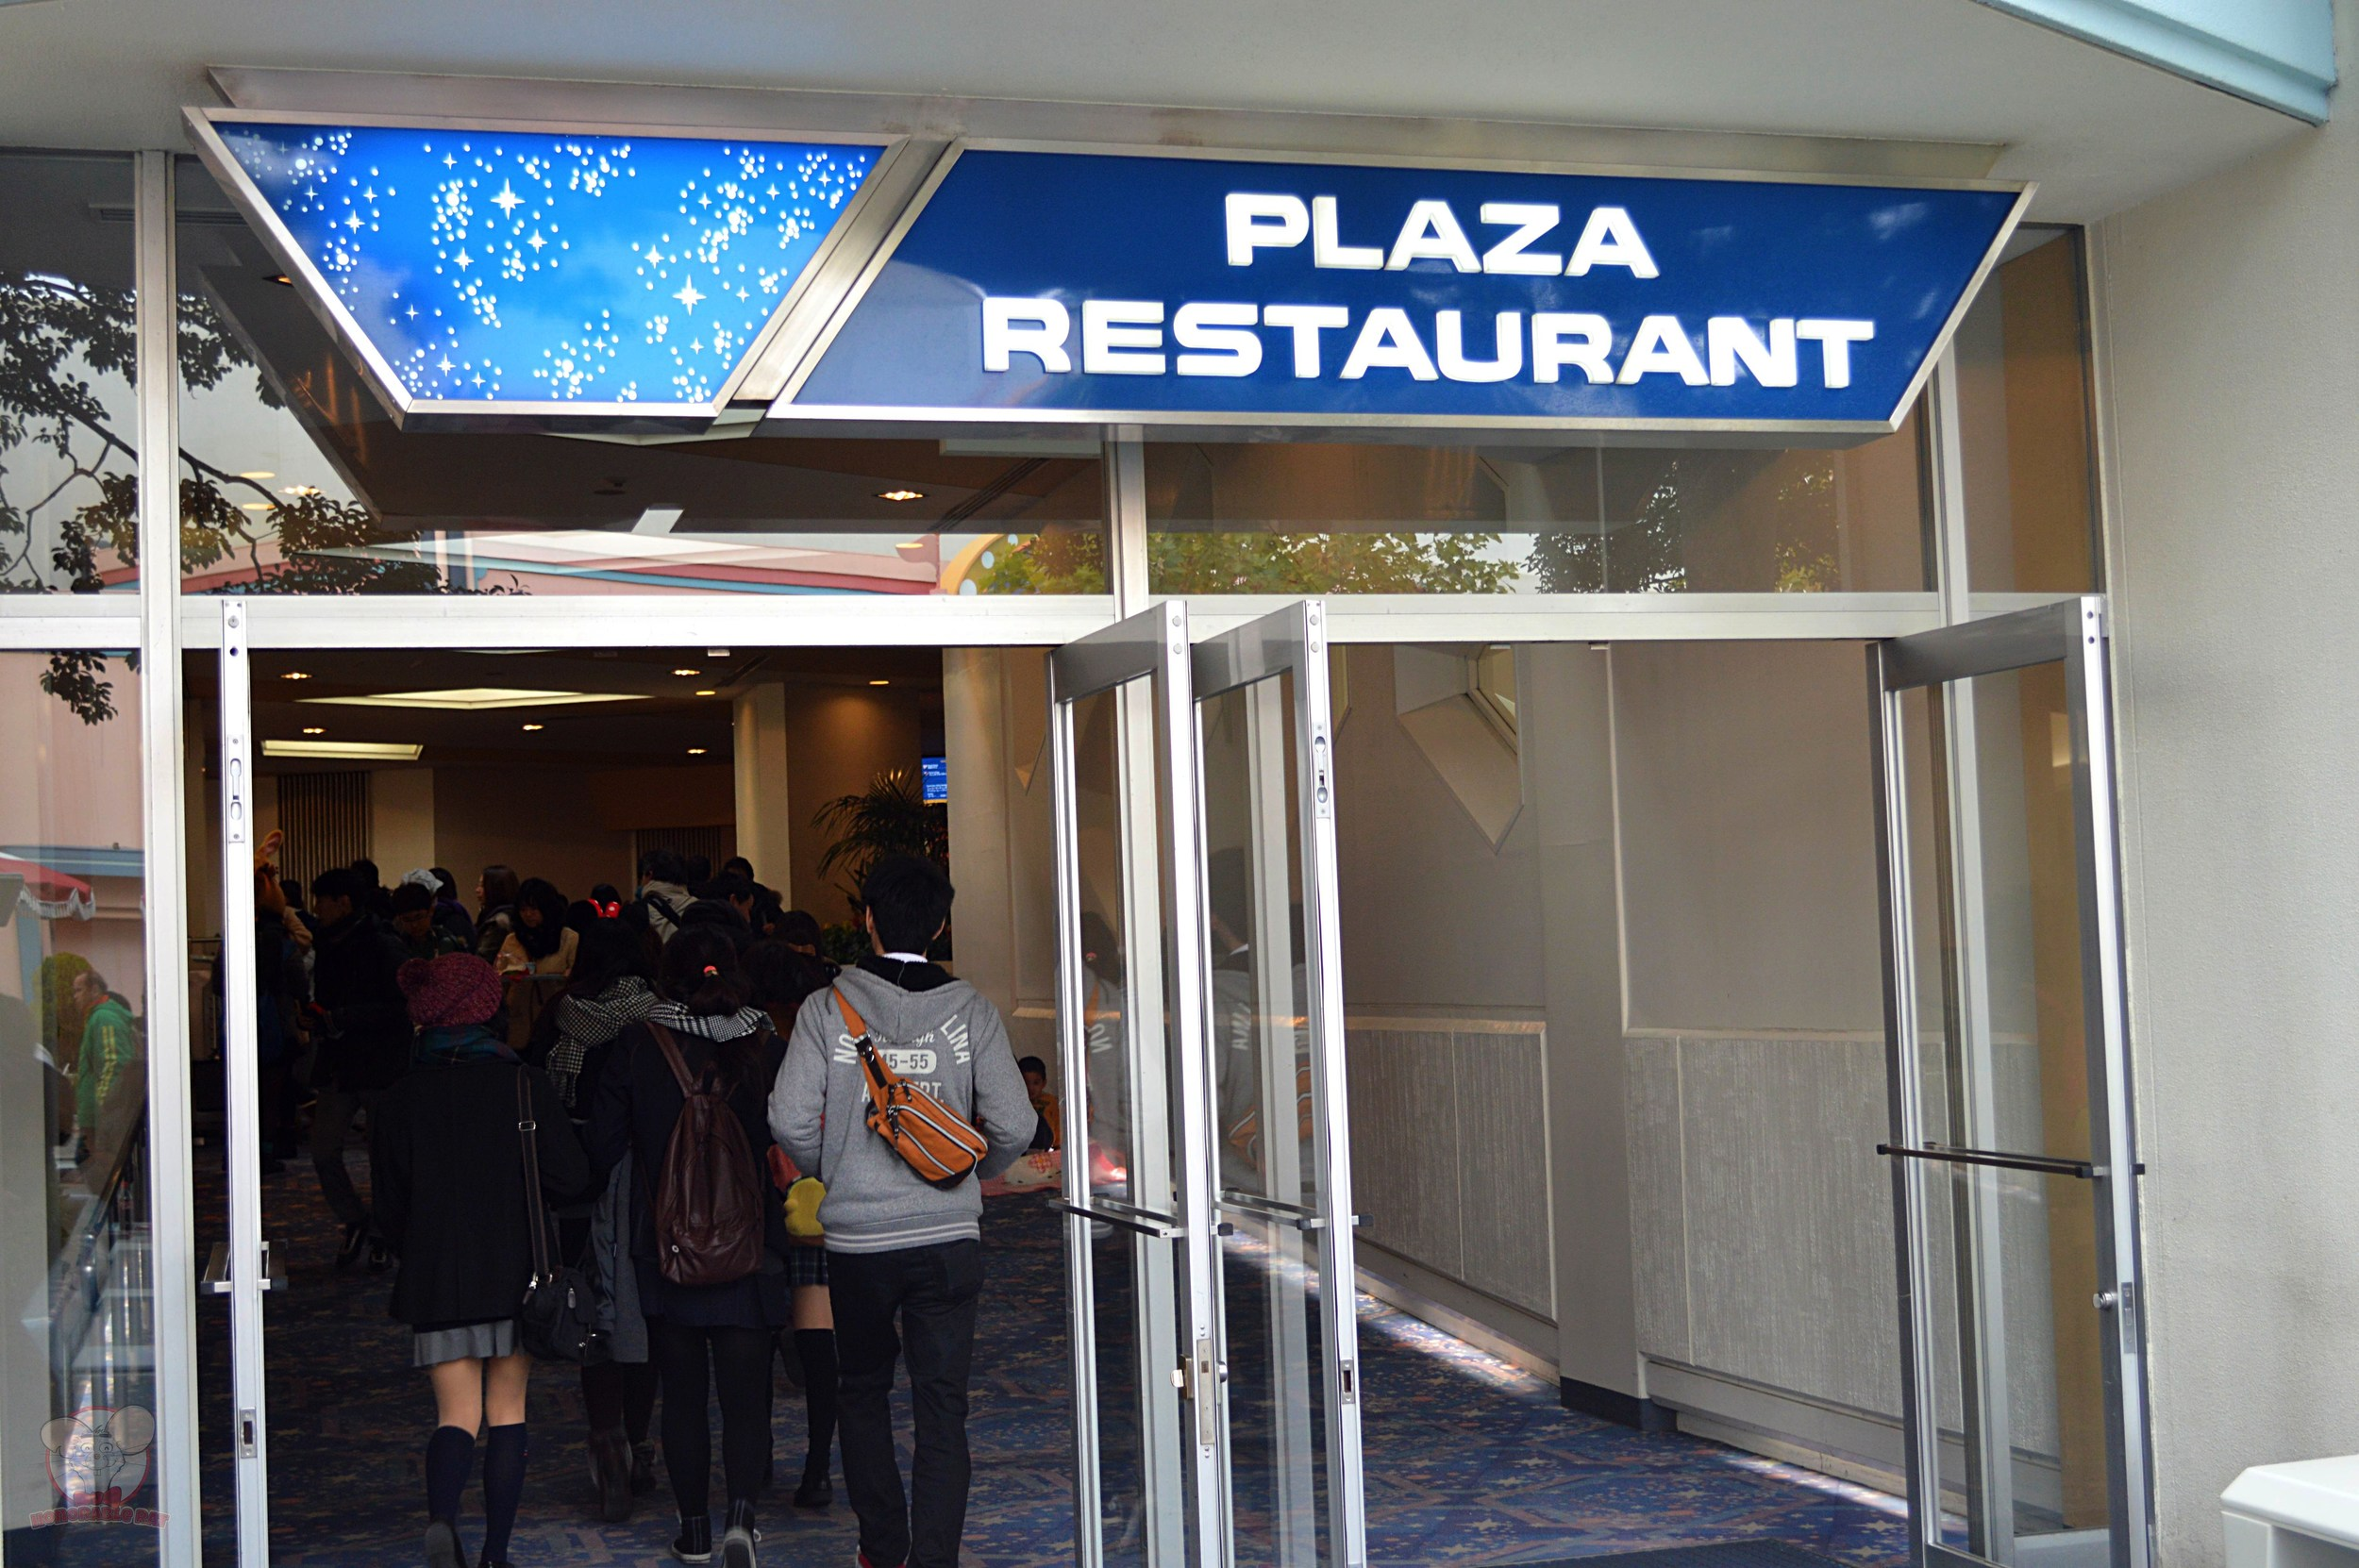 Plaza Restaurant Entrance